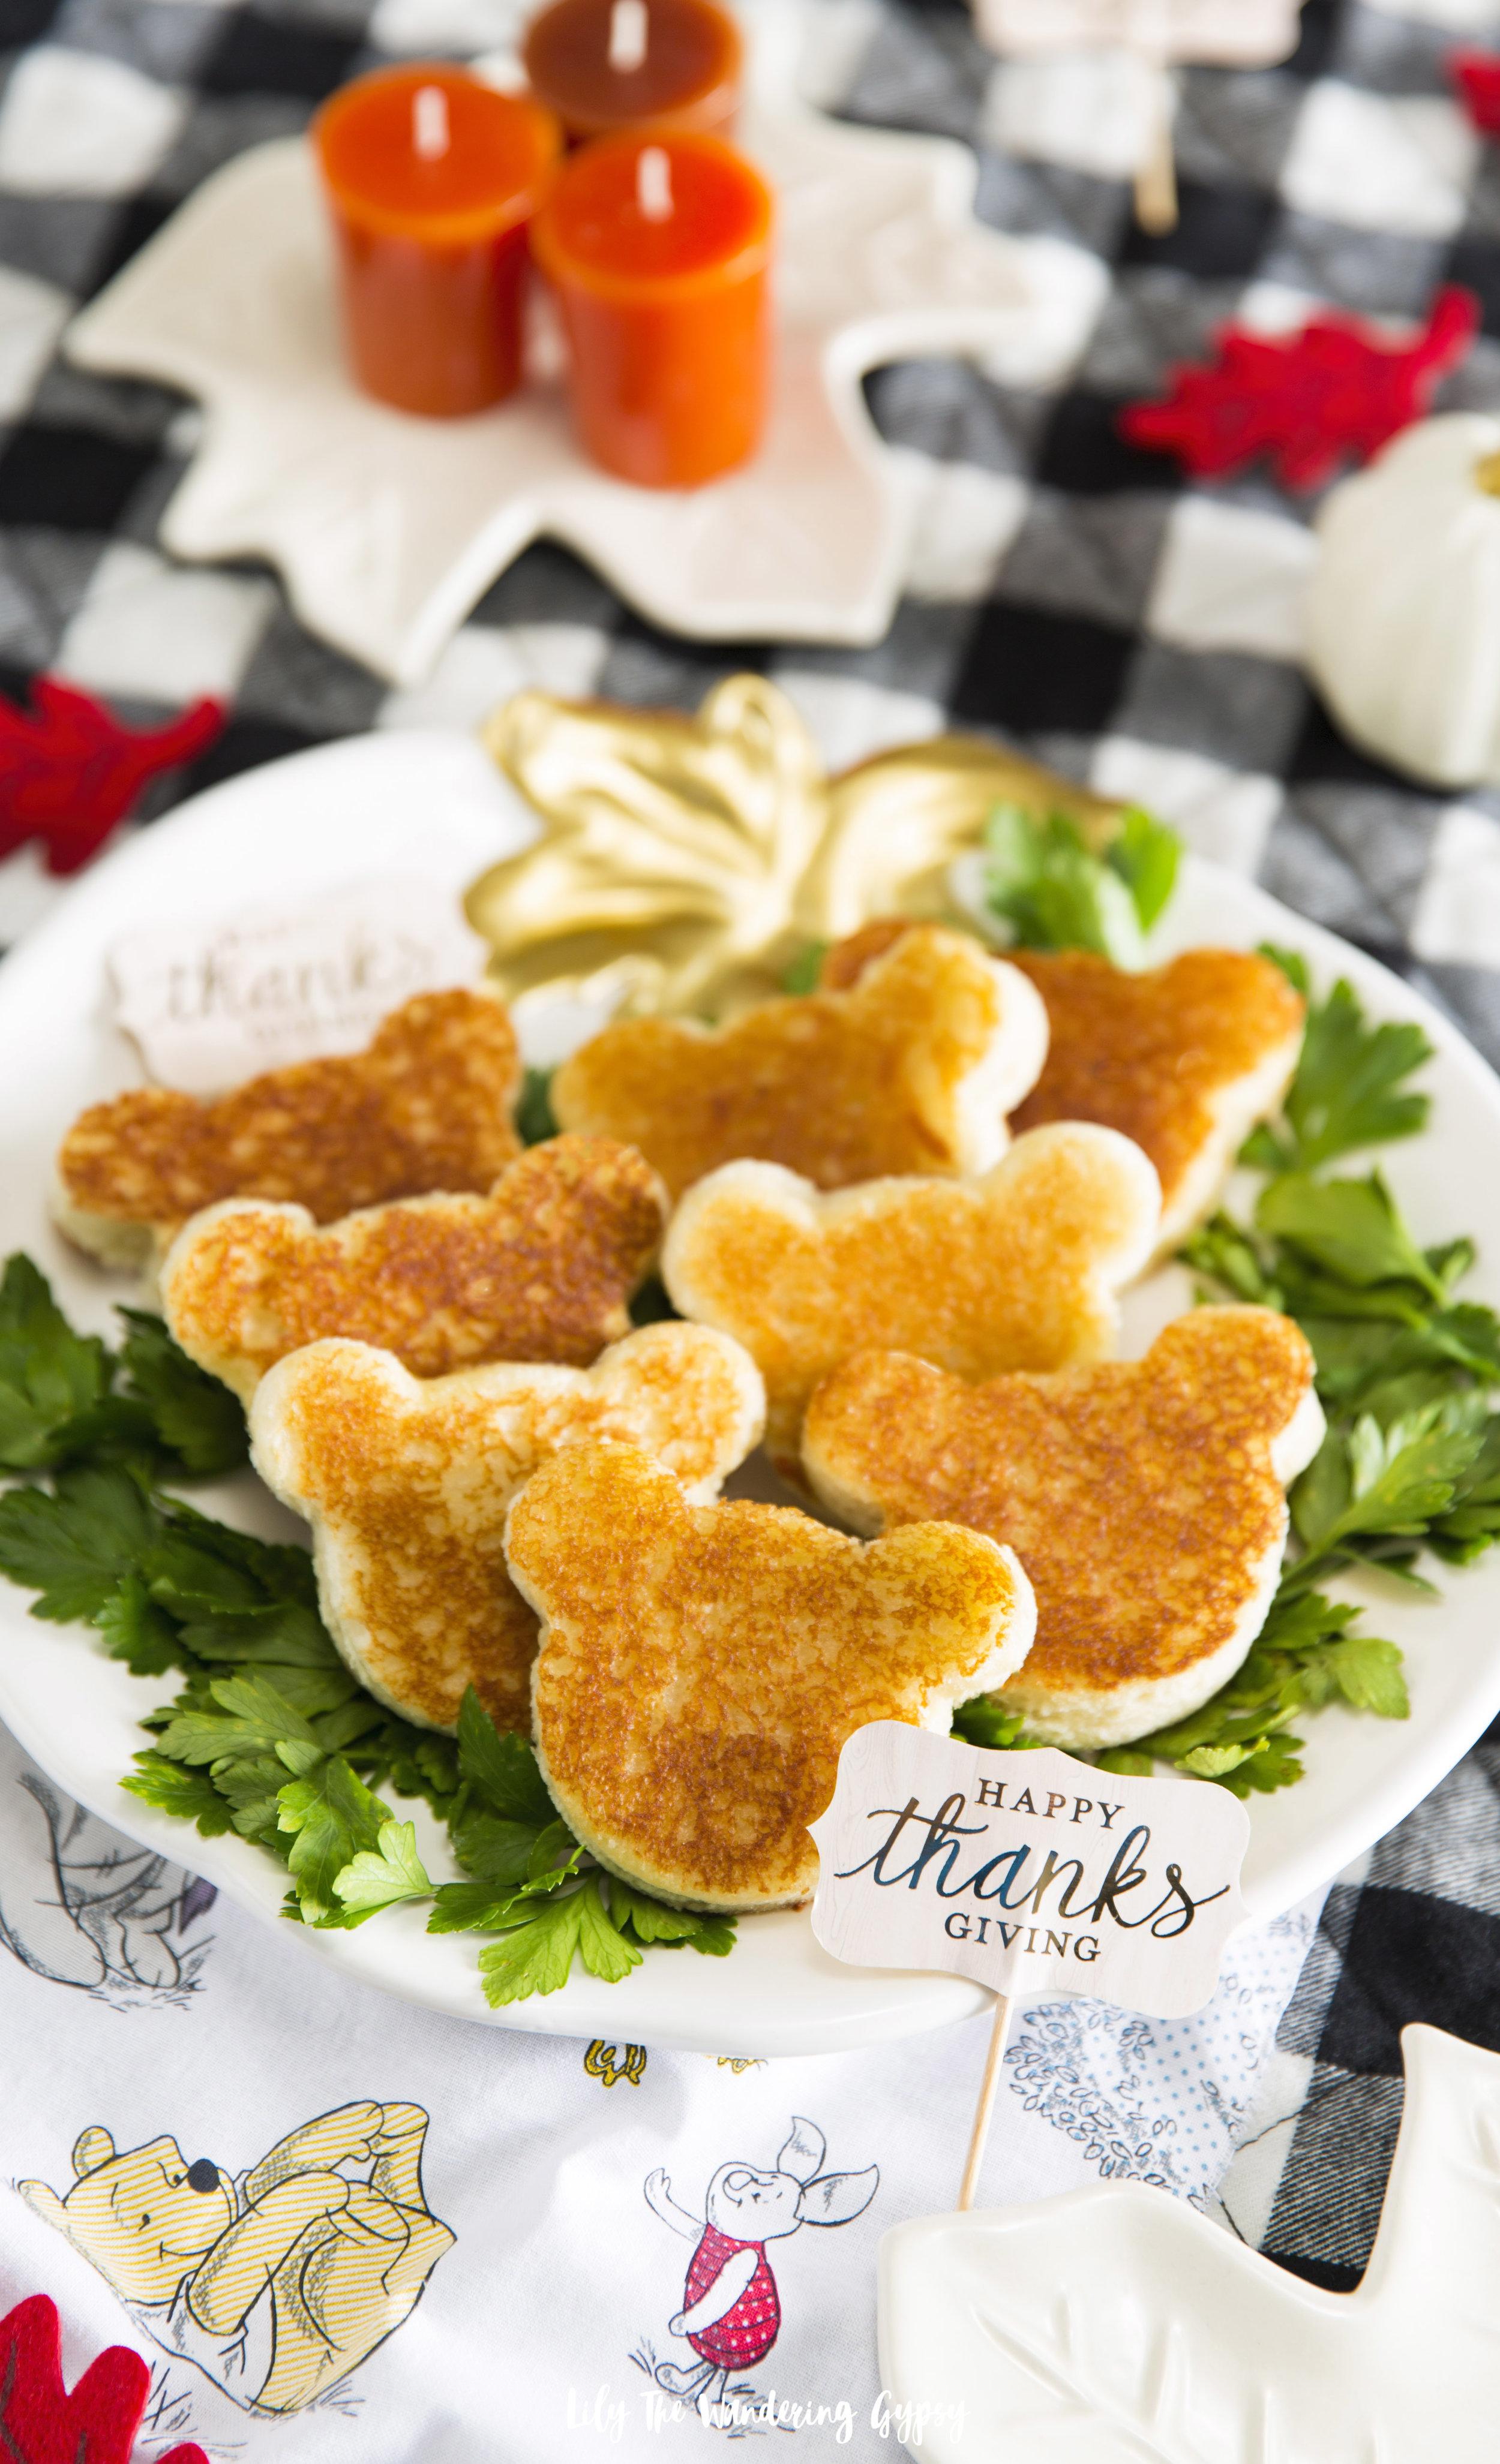 Winnie The Pooh Mini Sandwiches